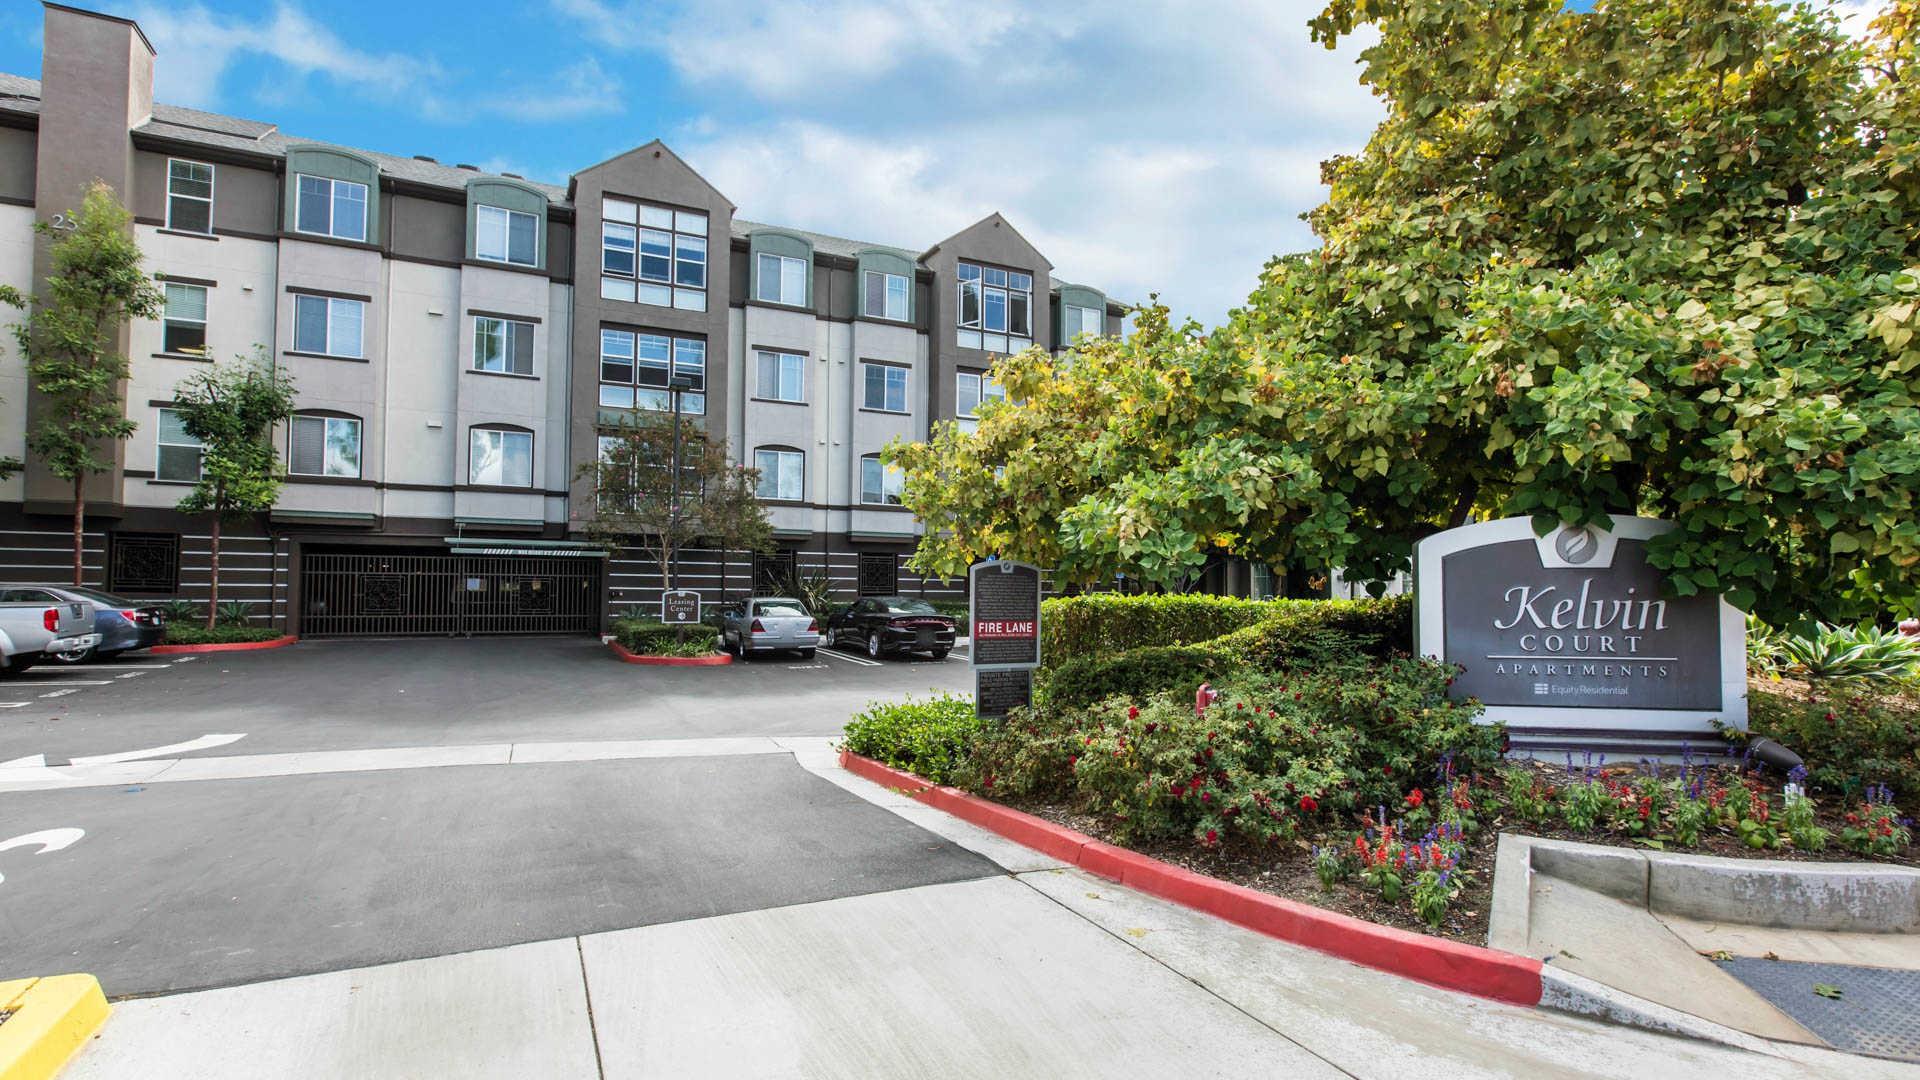 Apartments Near UC Irvine Kelvin Court for University of California - Irvine Students in Irvine, CA